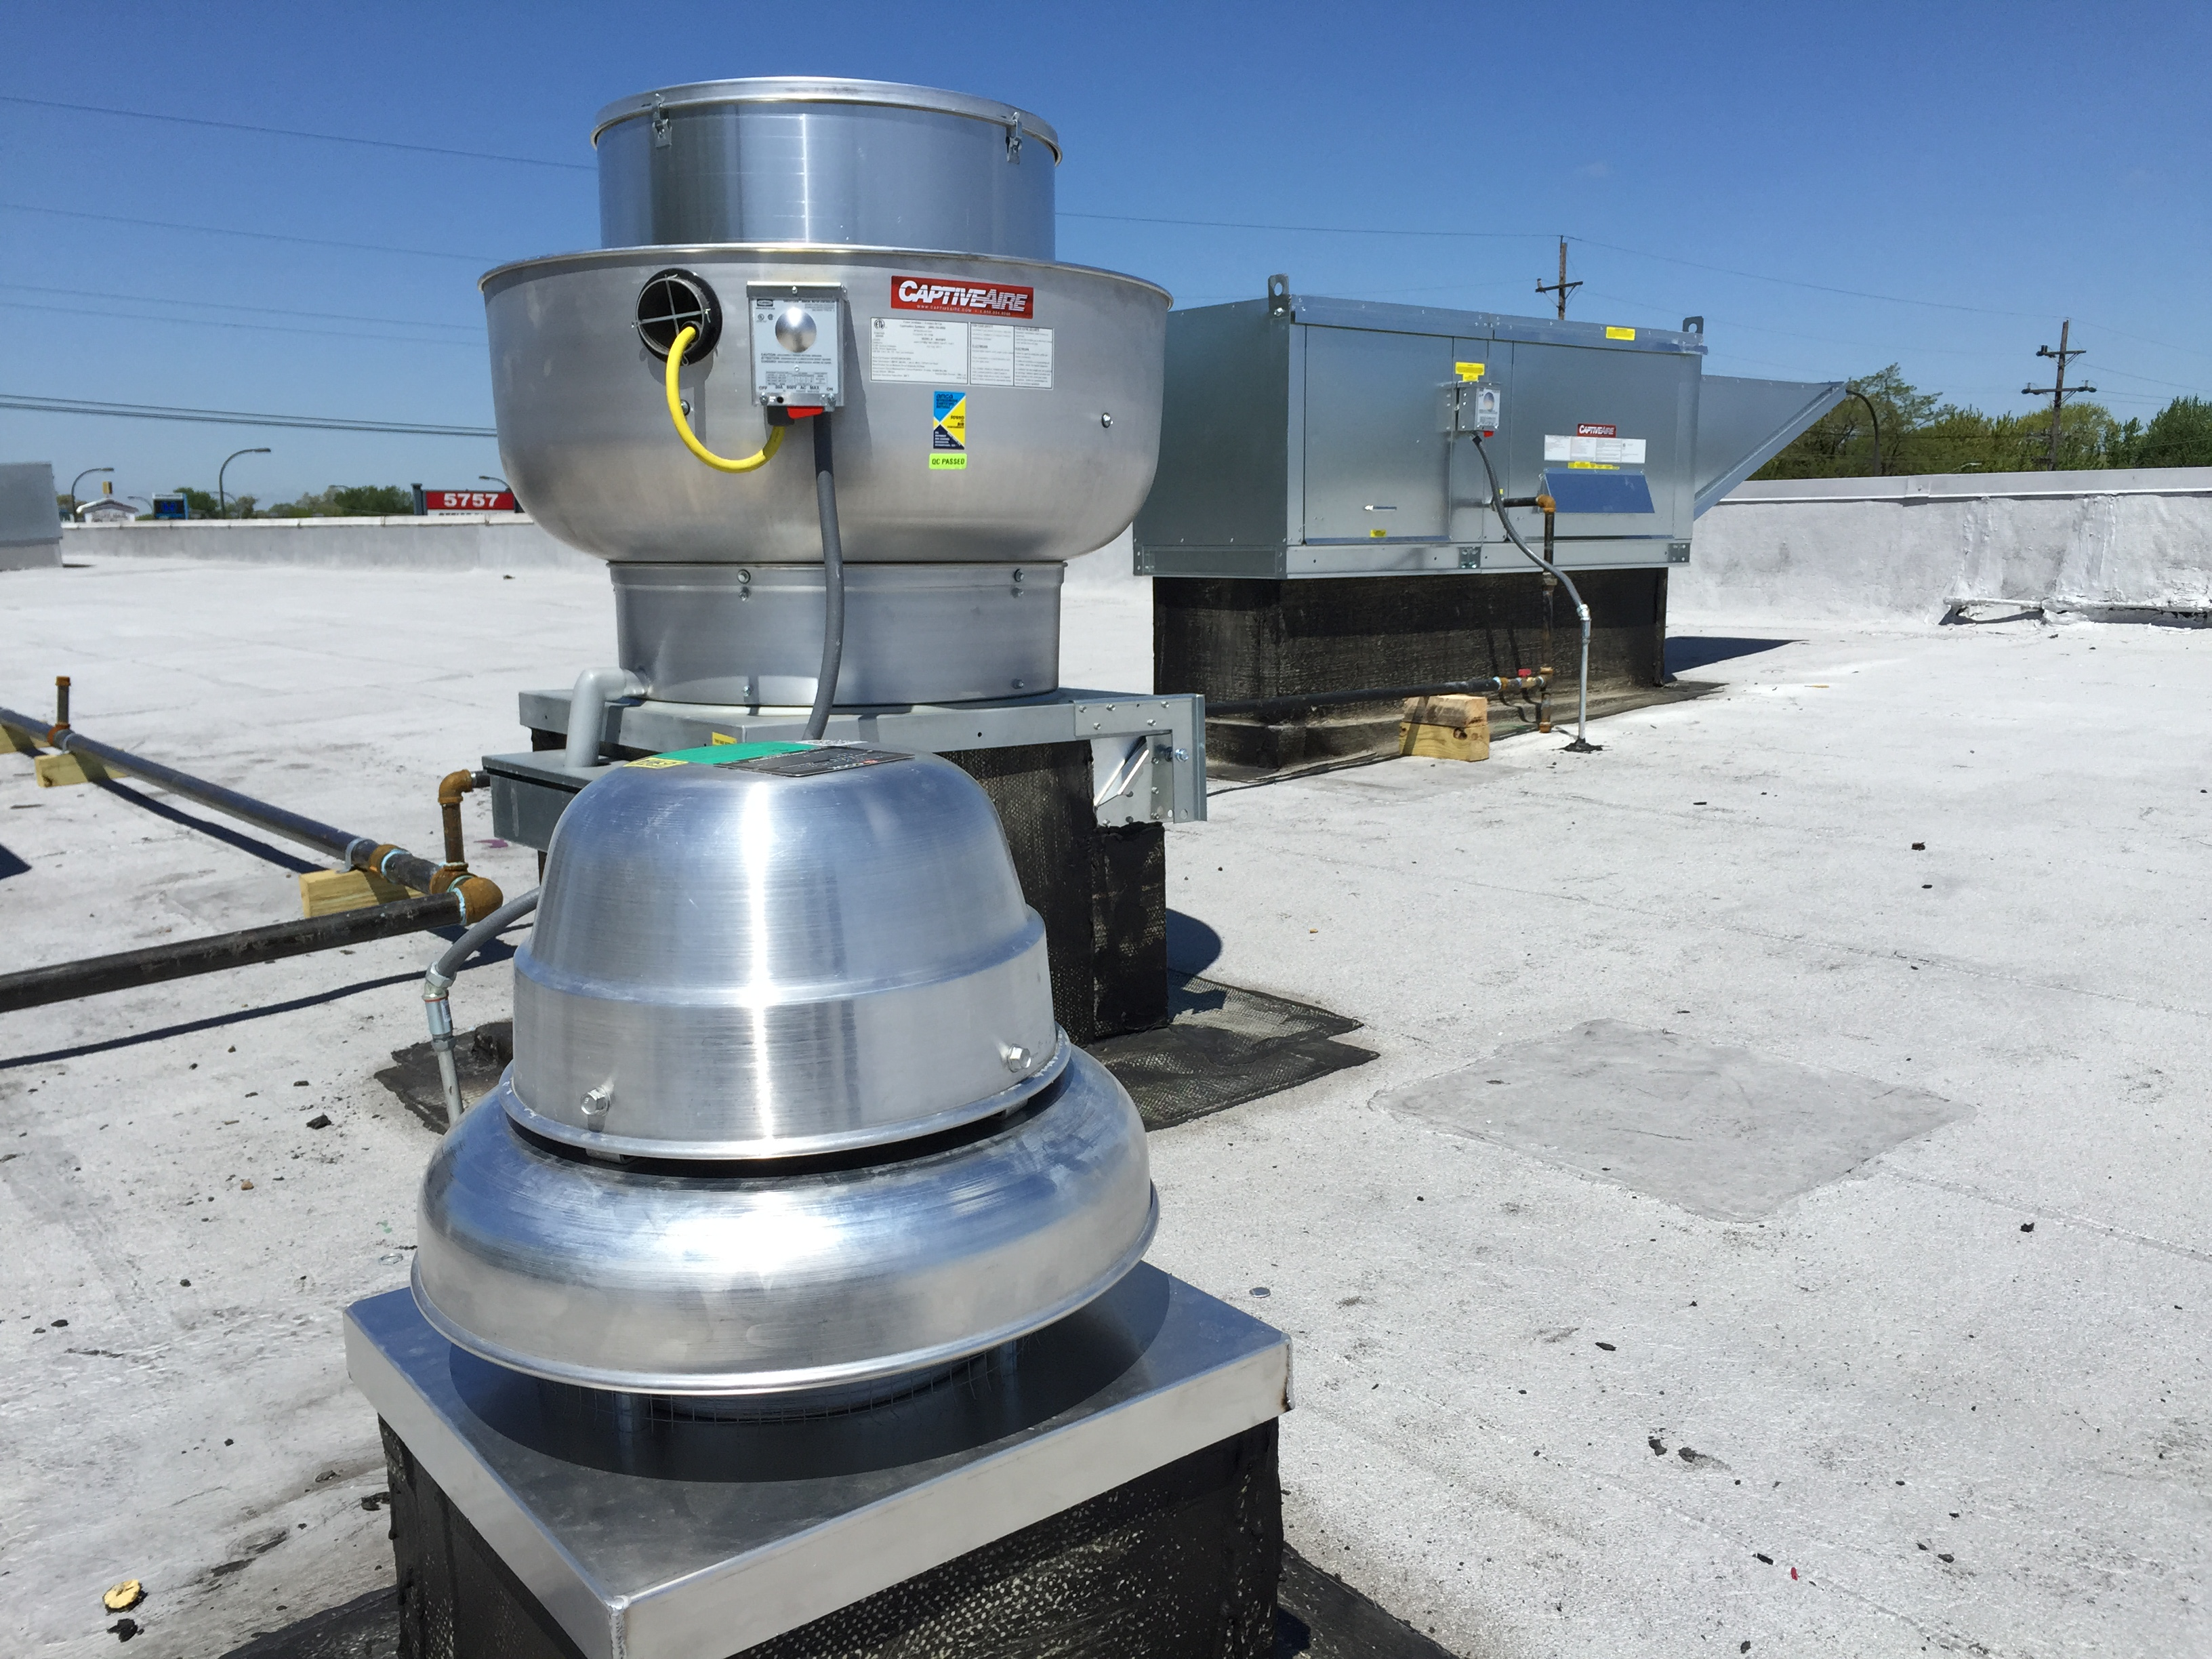 Chicago Home Improvement Service Captive Air Exhaust Fan